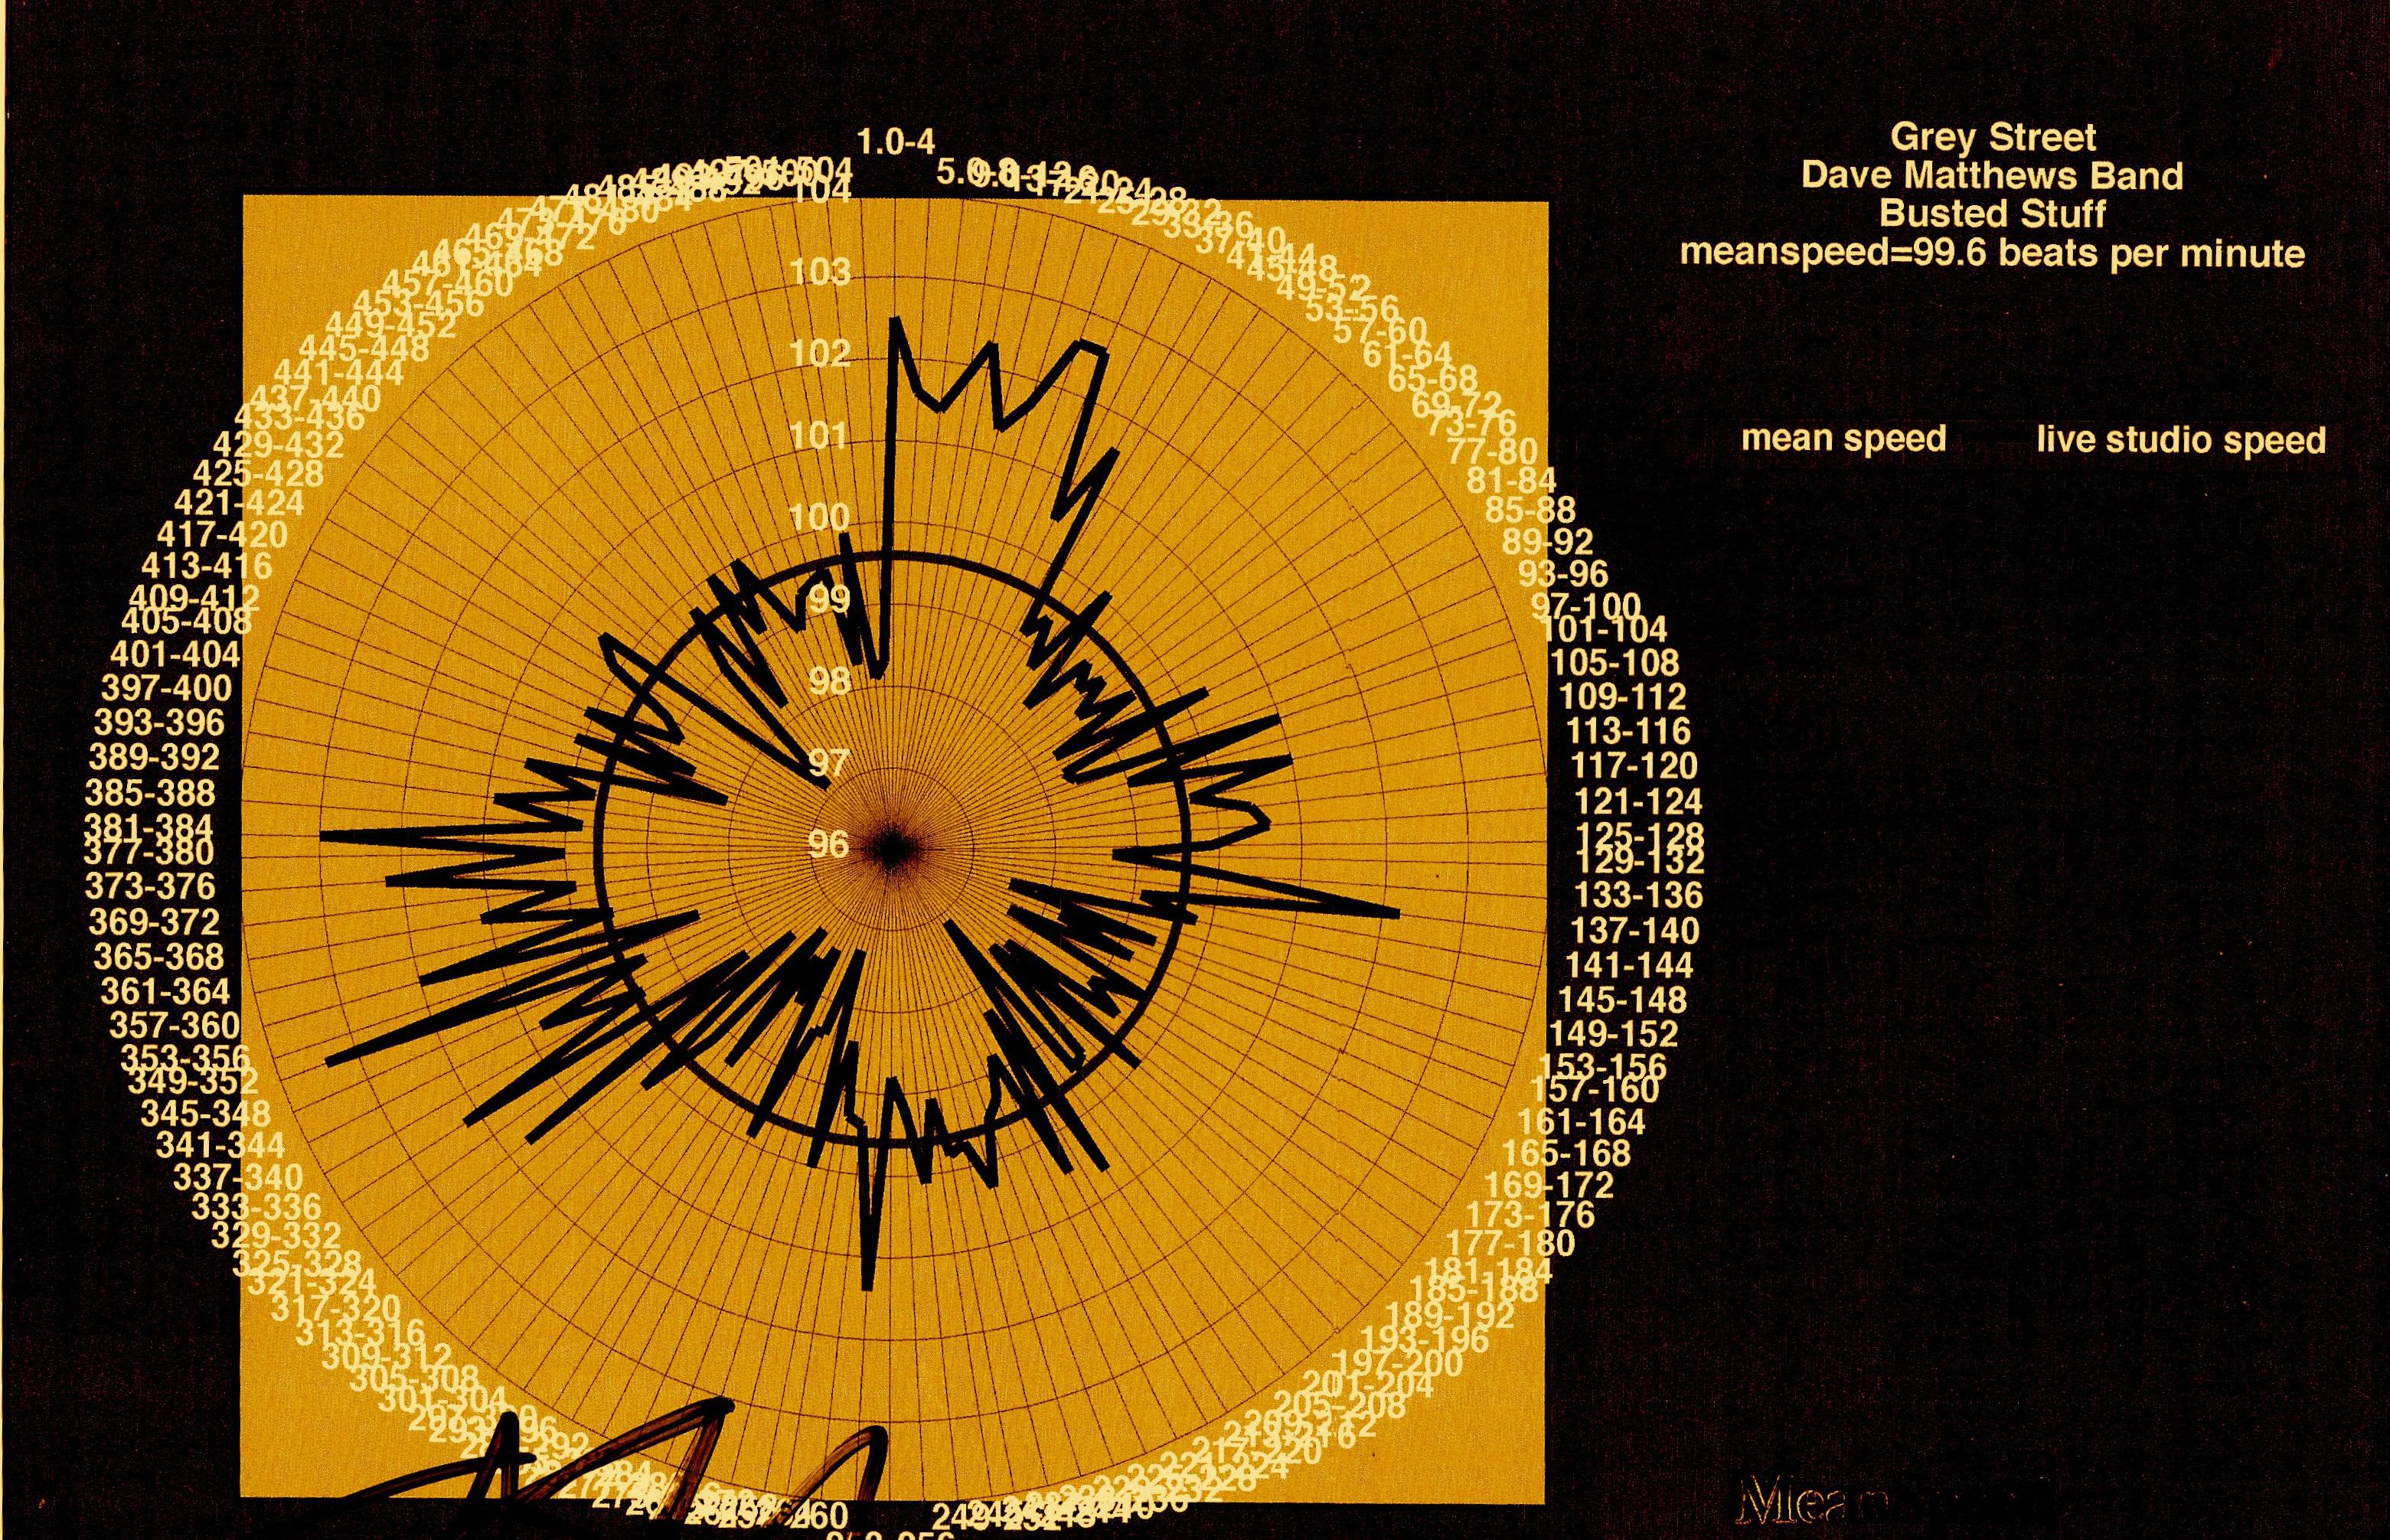 Grey-Street-Dave-Matthews-Band-modern-tempo-map